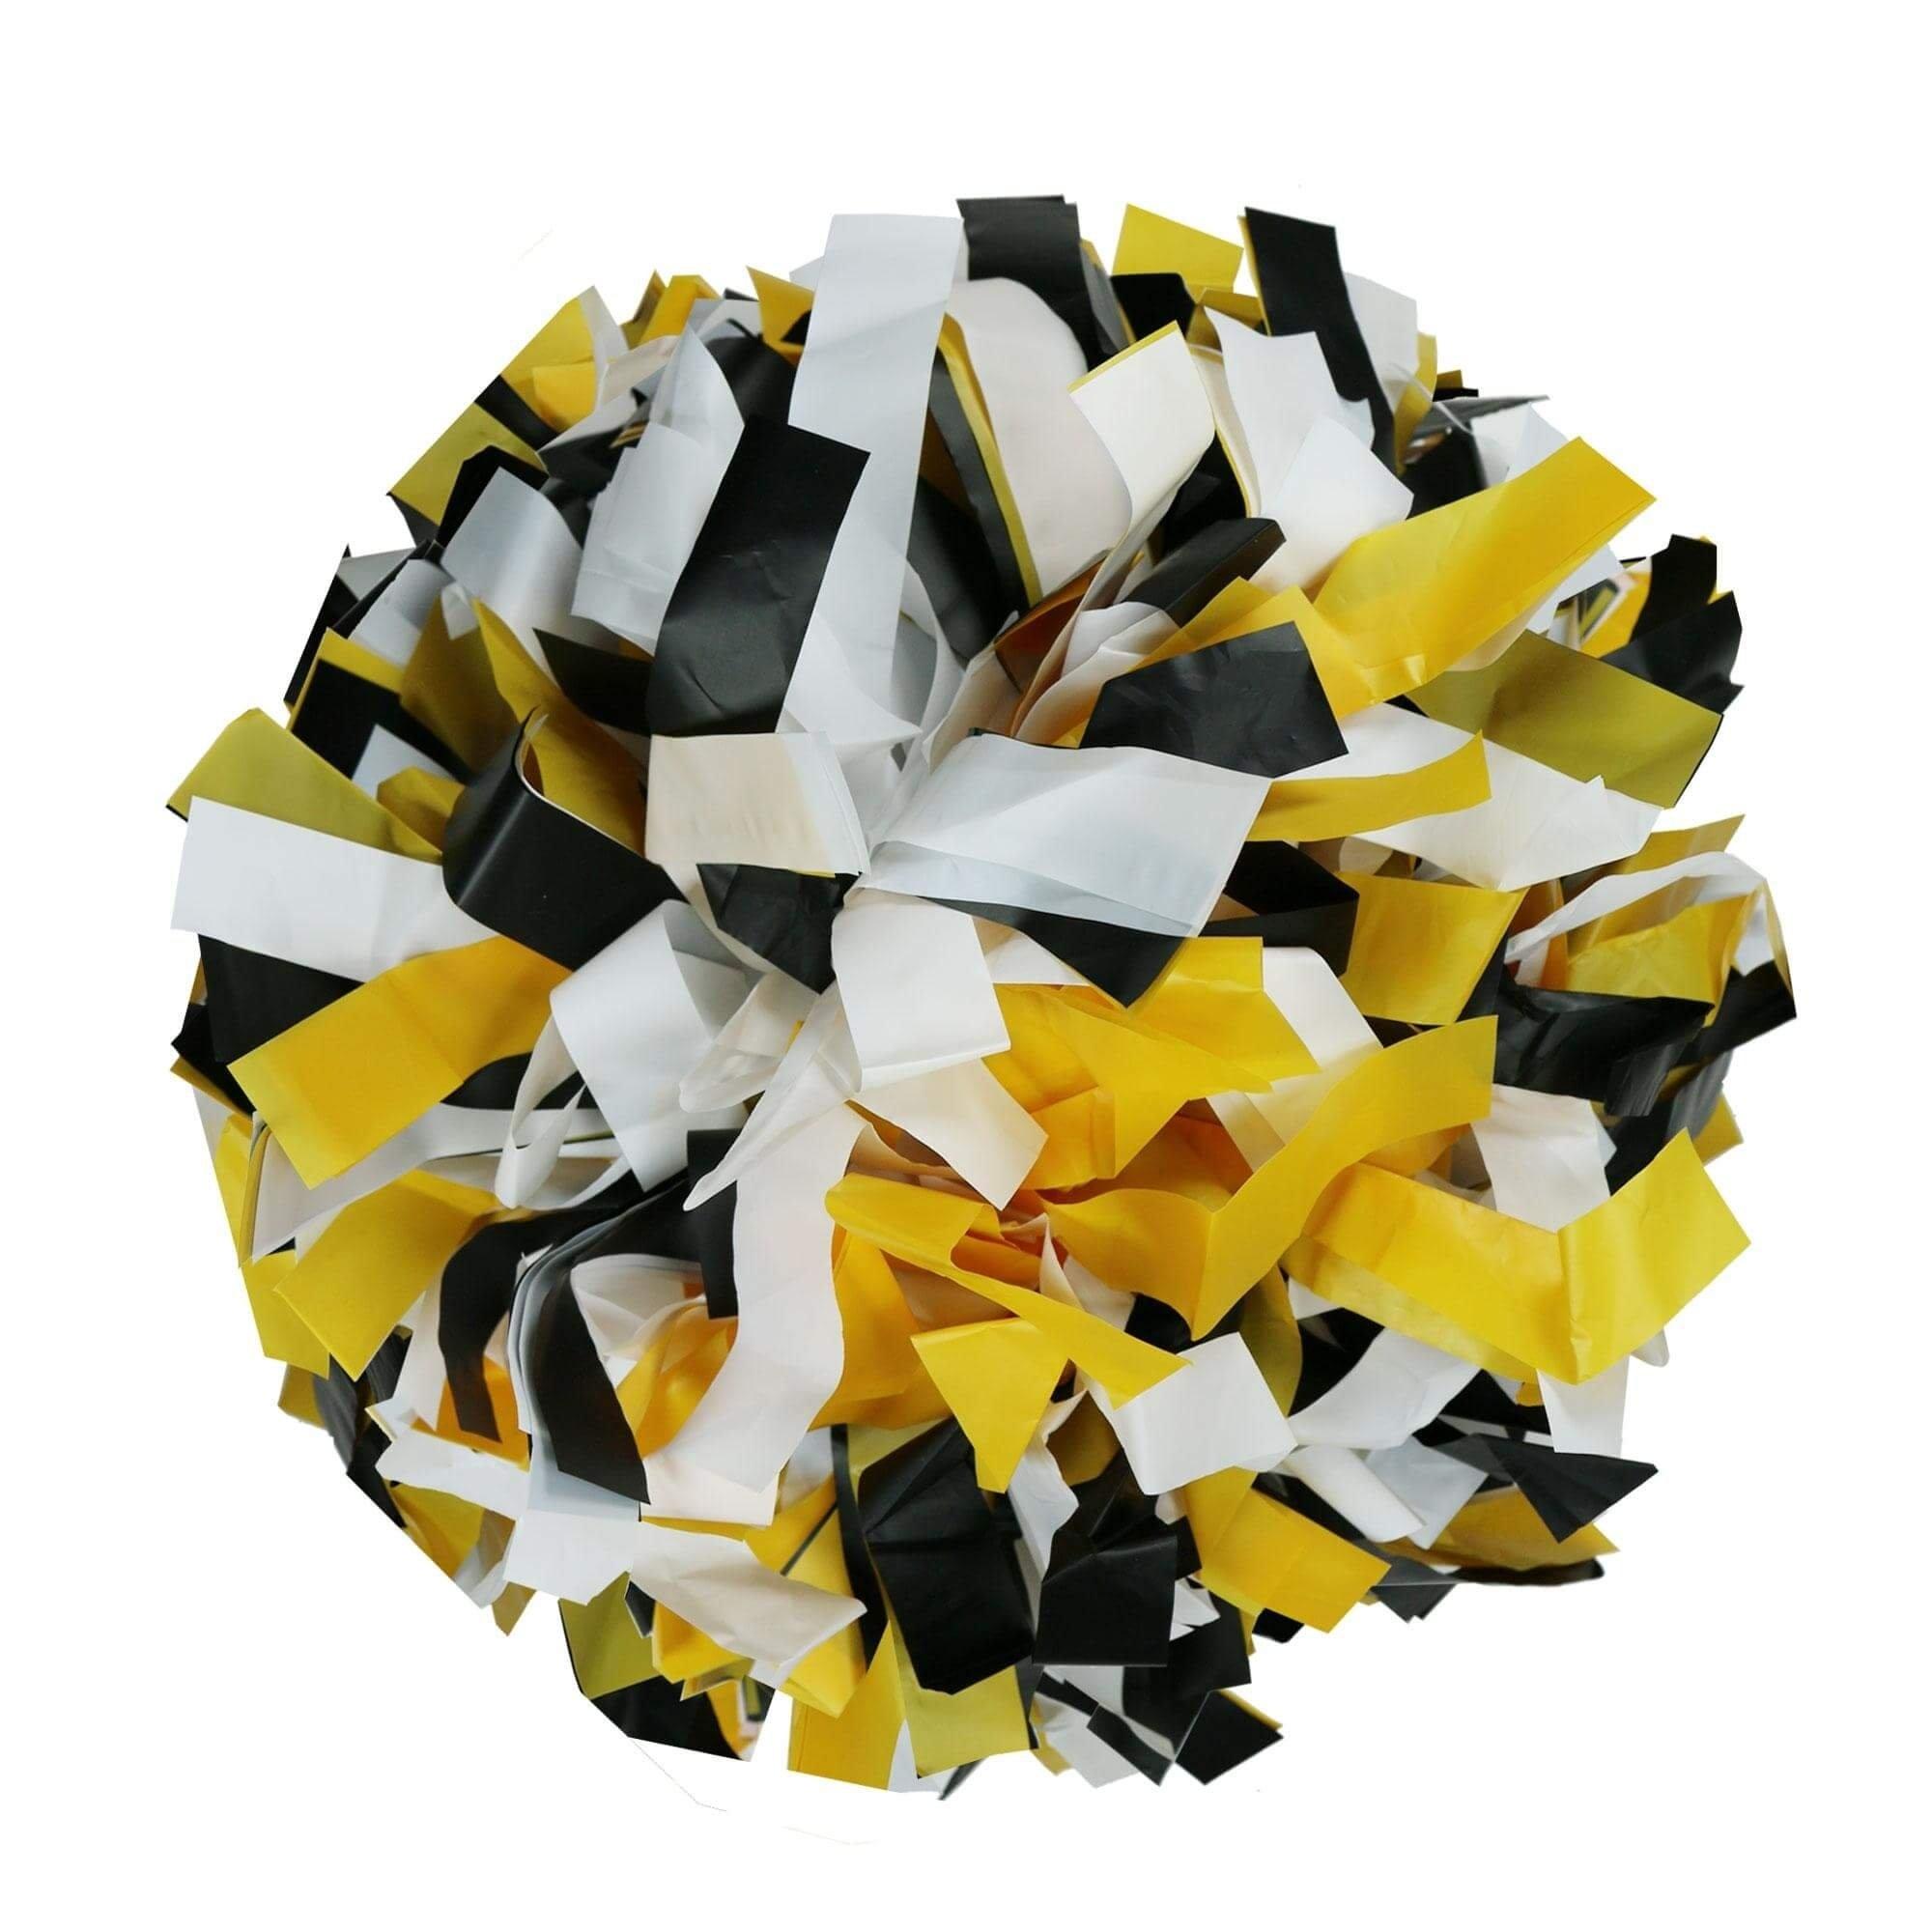 Danzcue Black/gold/white Plastic Poms - One Pair